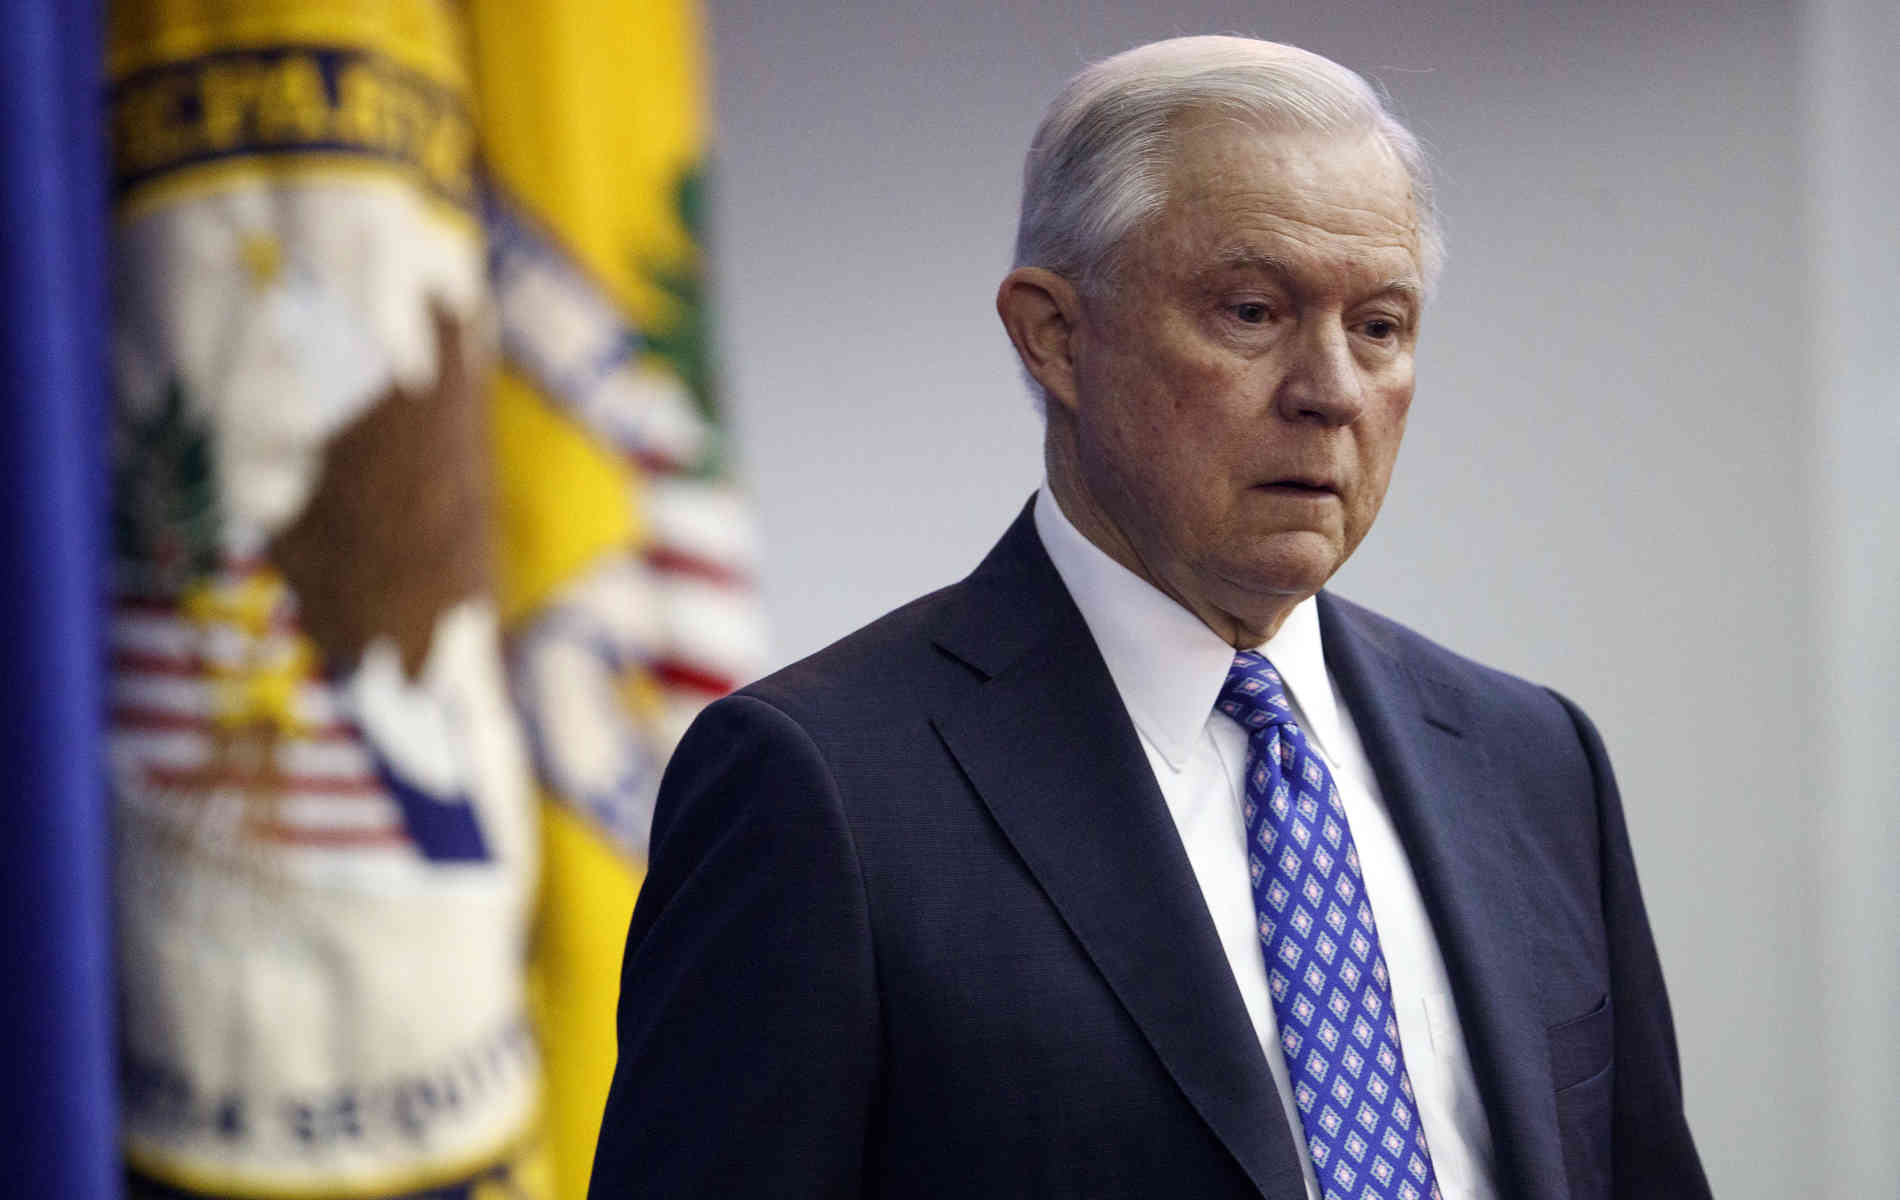 US-Justizminister Sessions tritt zurück - auf Trumps Drängen